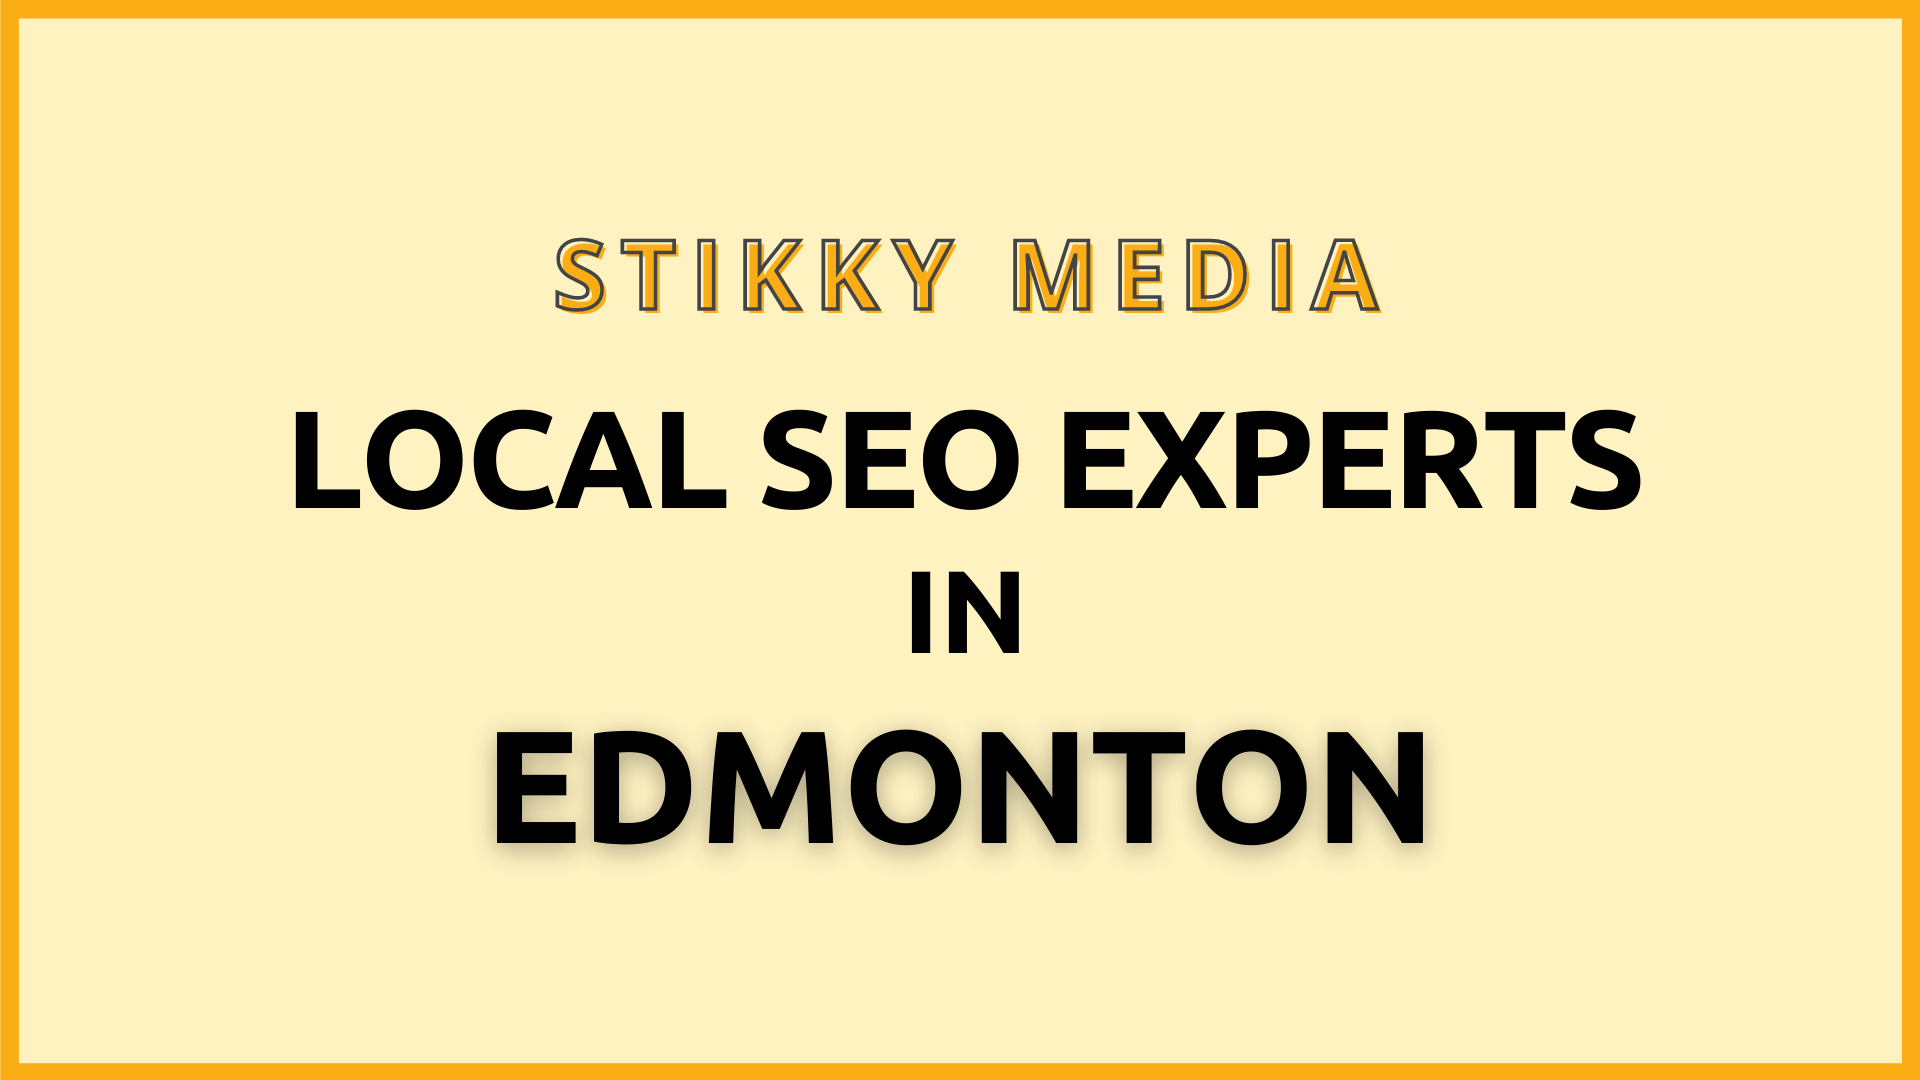 Local SEO services in Edmonton - Stikky Media